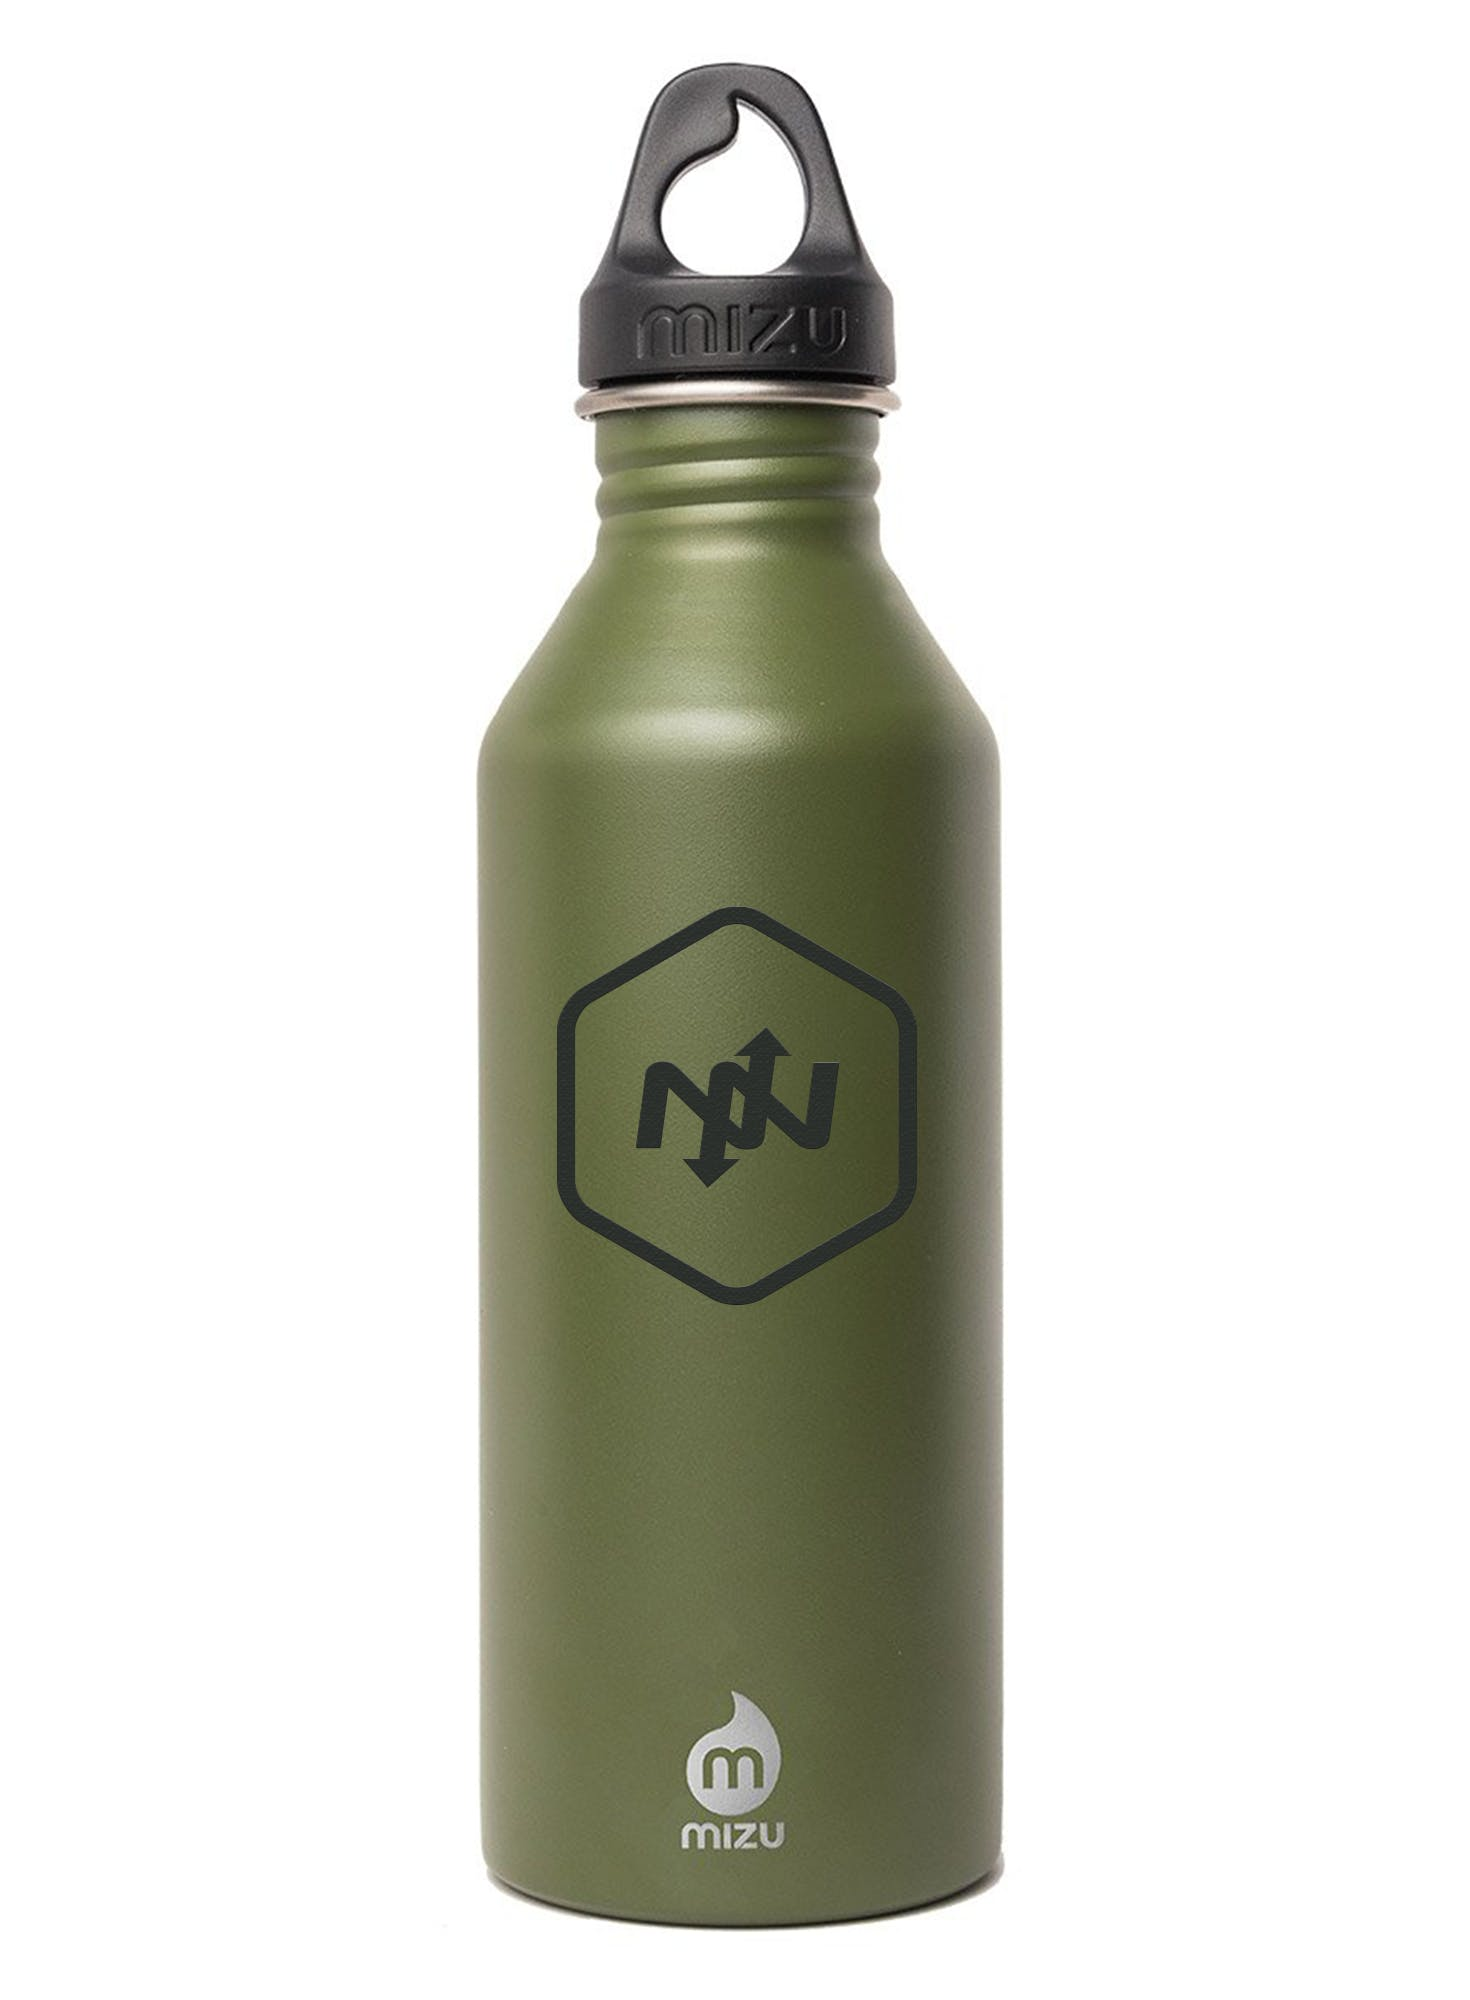 Onnit x MIZU M8 Water Bonus Image